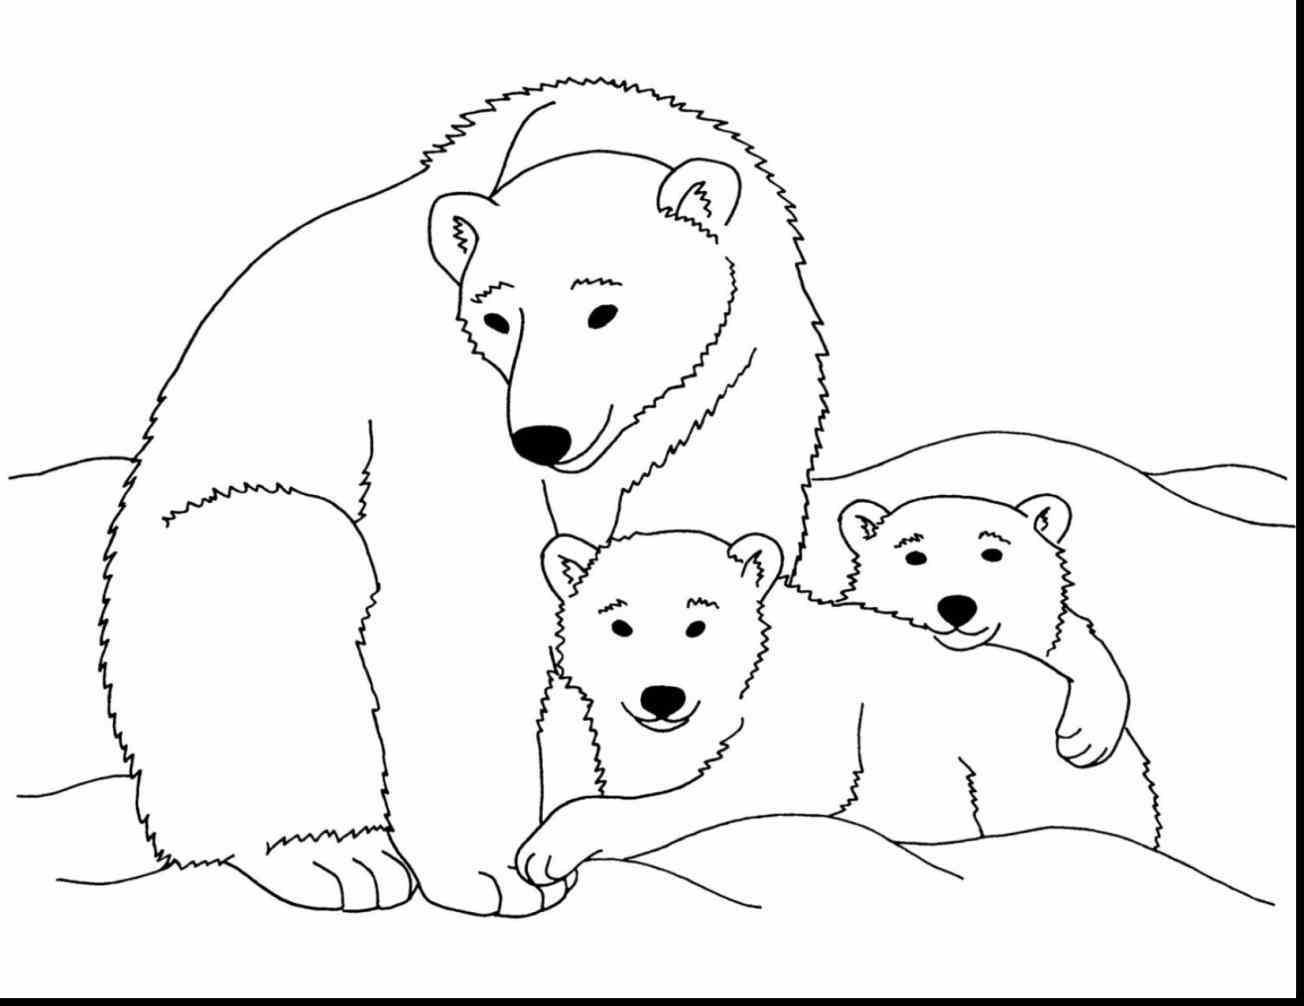 Polar Bear Coloring Sheet  Polar Bear Coloring Sheet Page Image Clipart